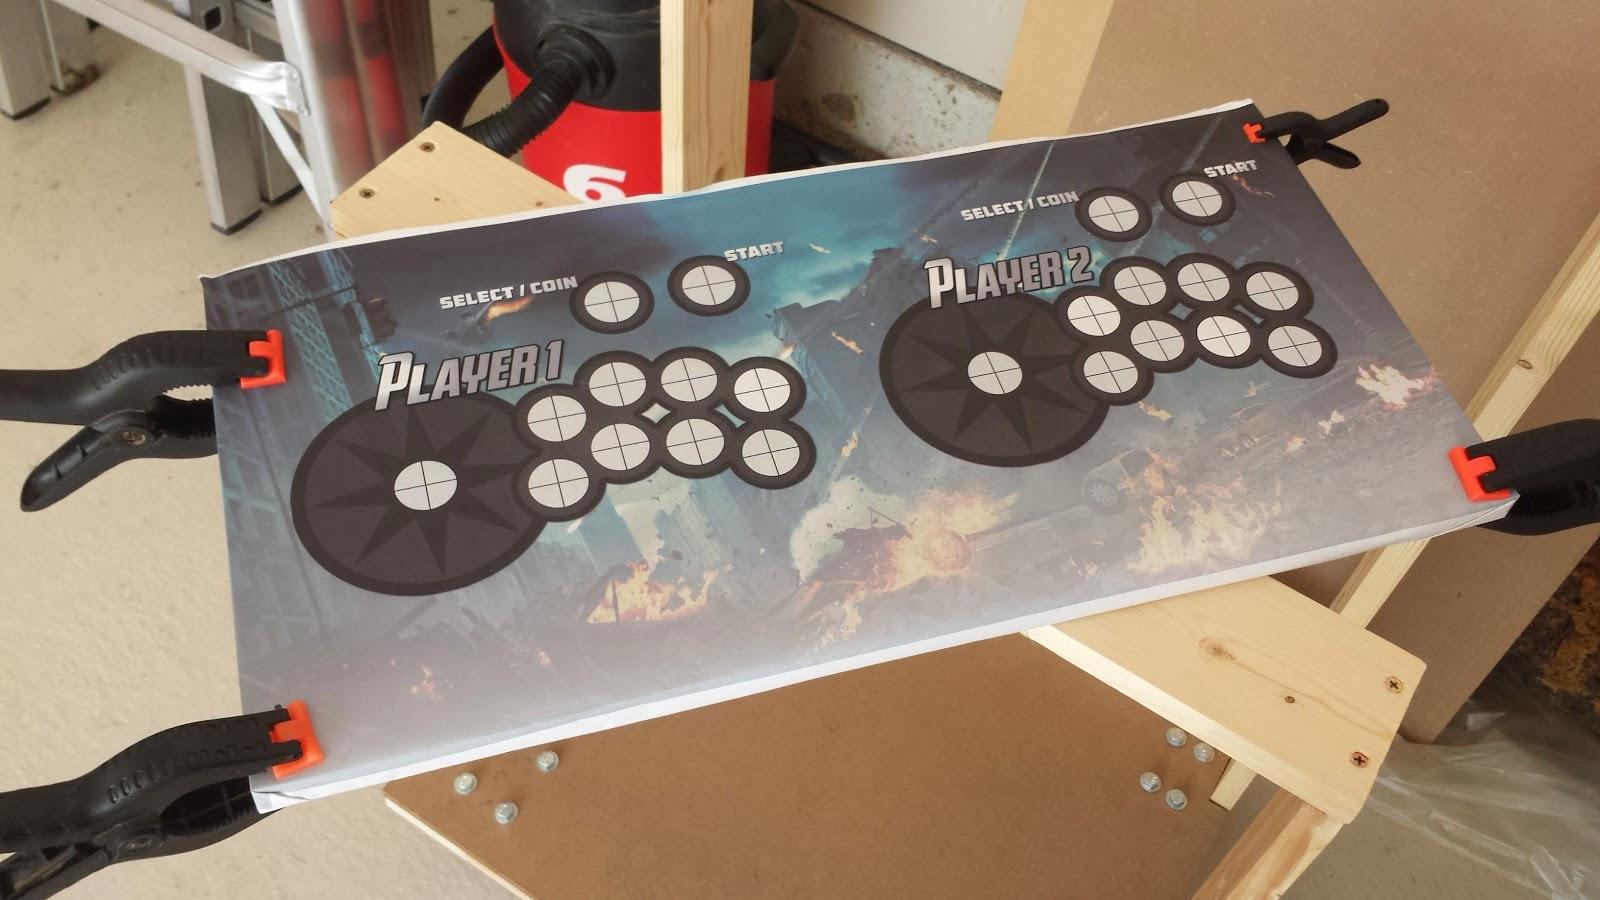 Arcade Cabinet: Control Panel | RxBrad.com